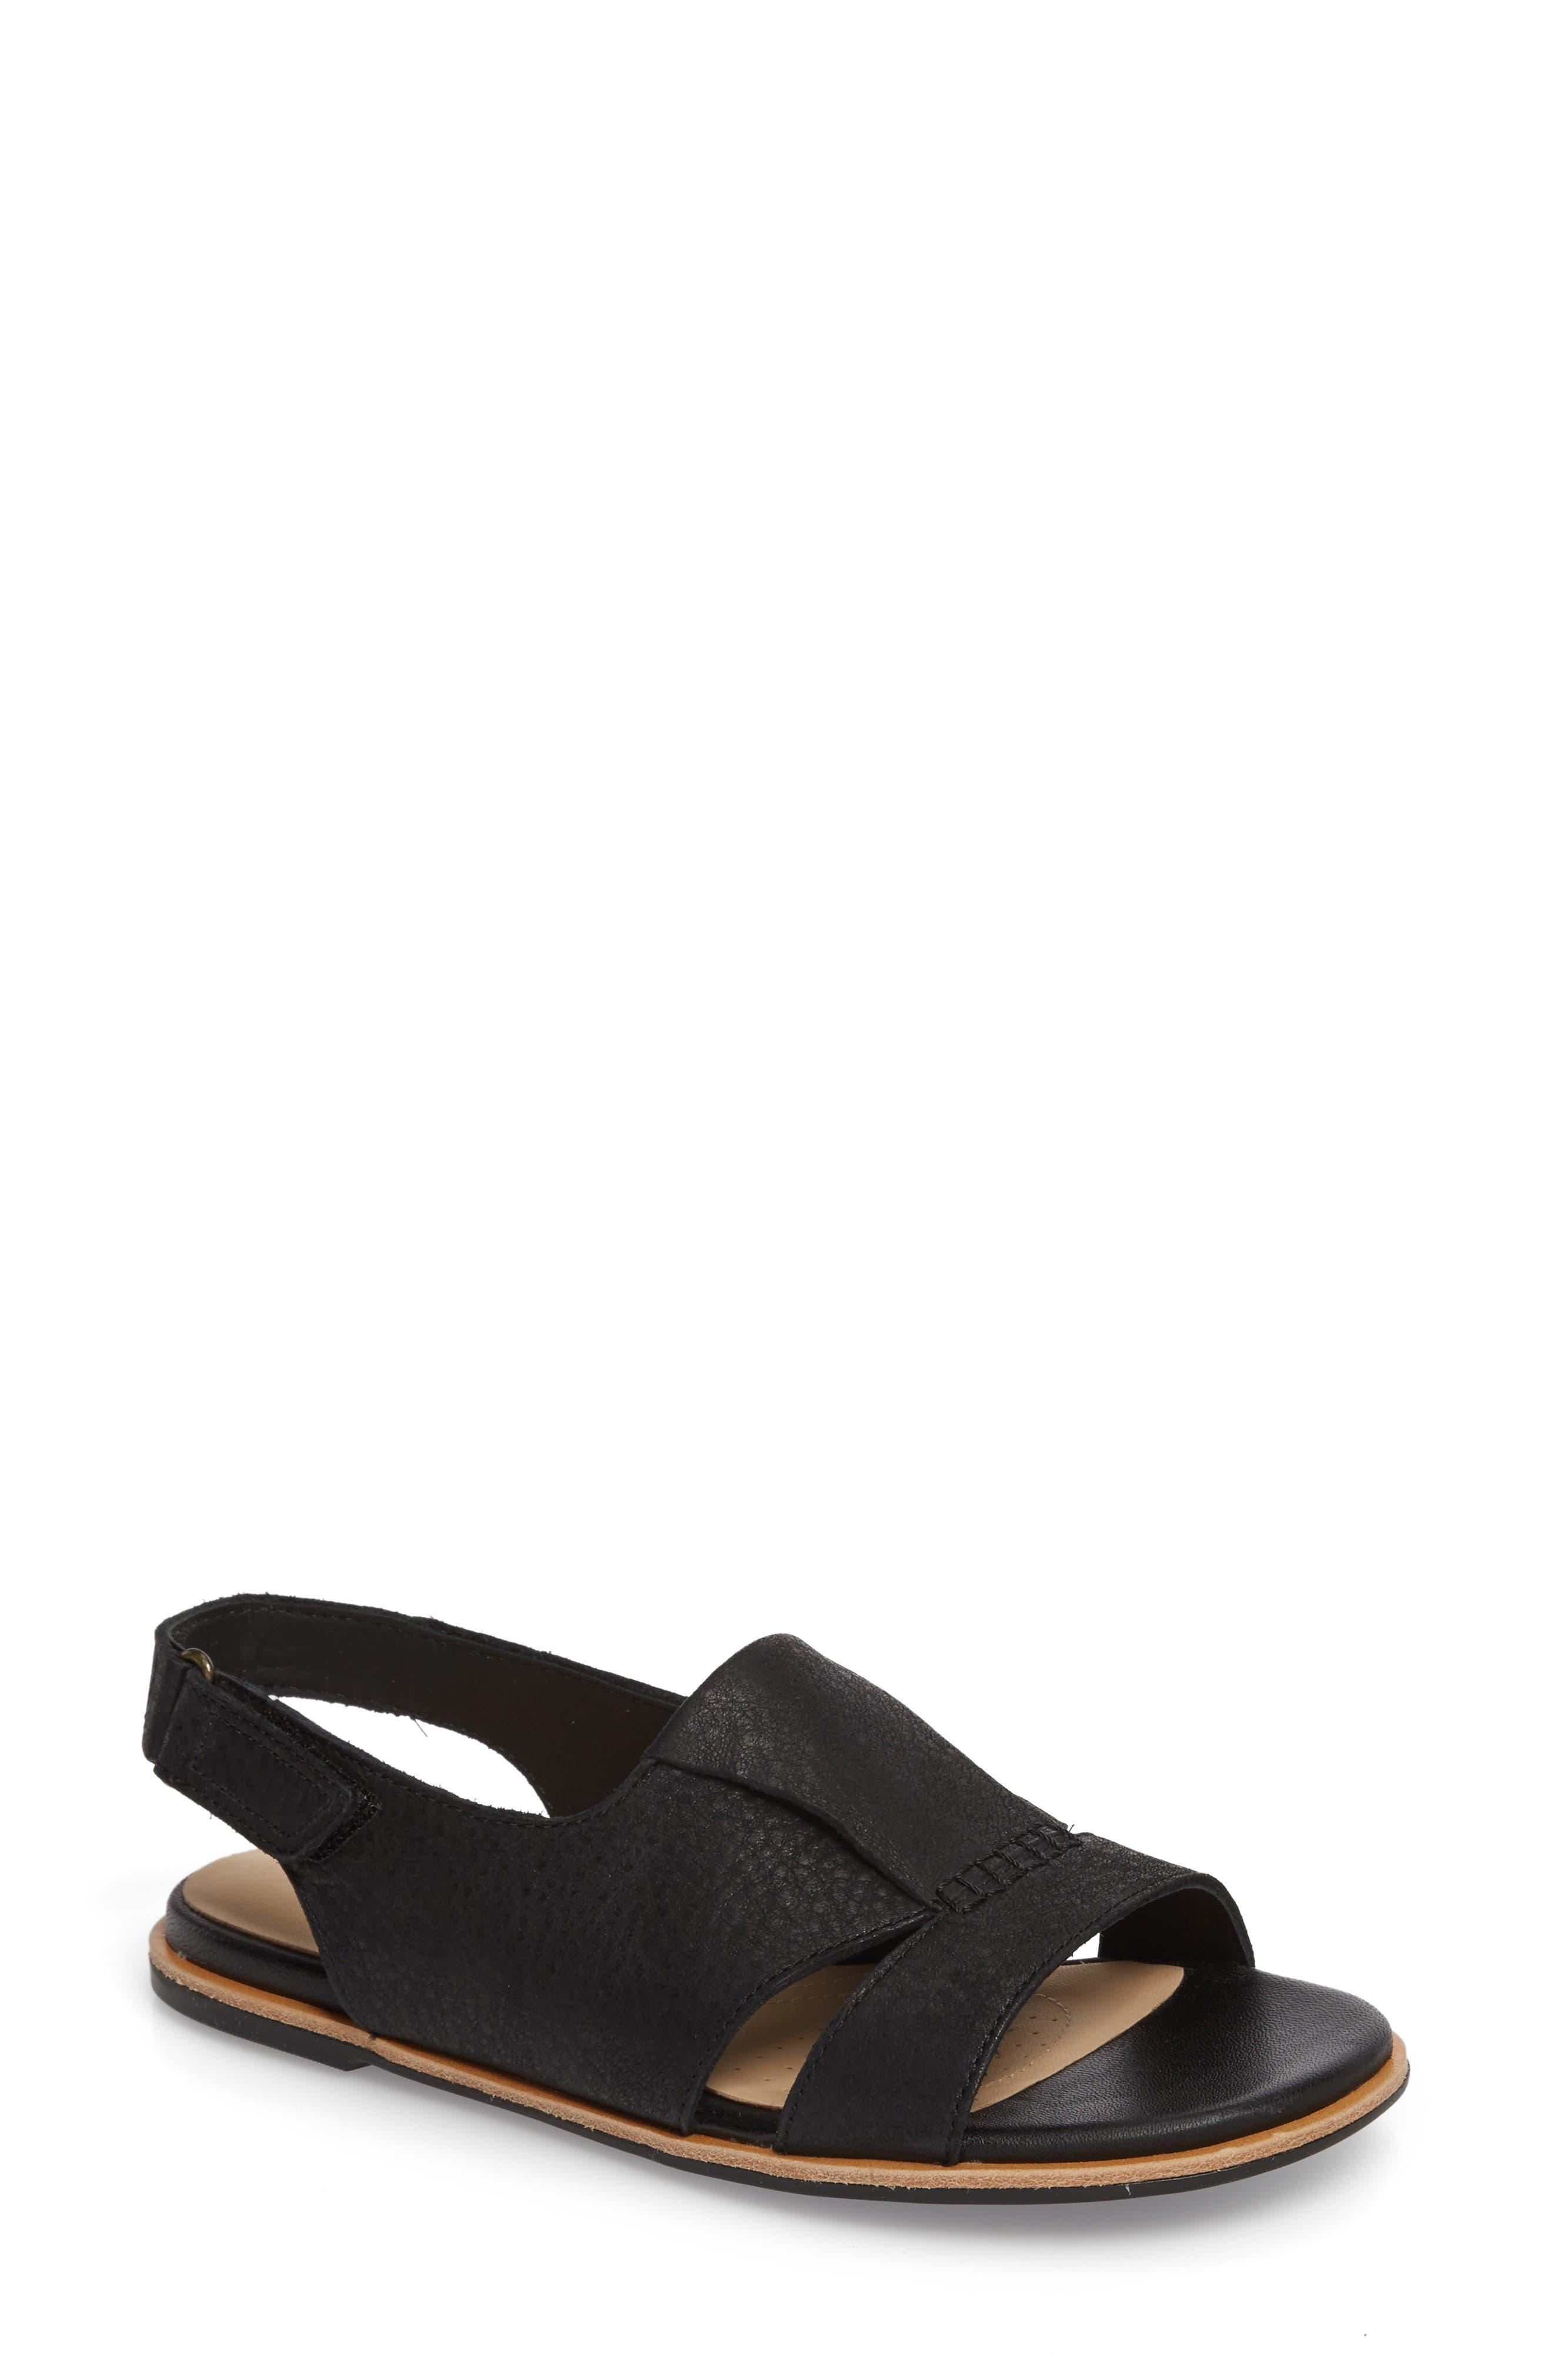 Sultana Rayne Slingback Sandal,                         Main,                         color, BLACK LEATHER